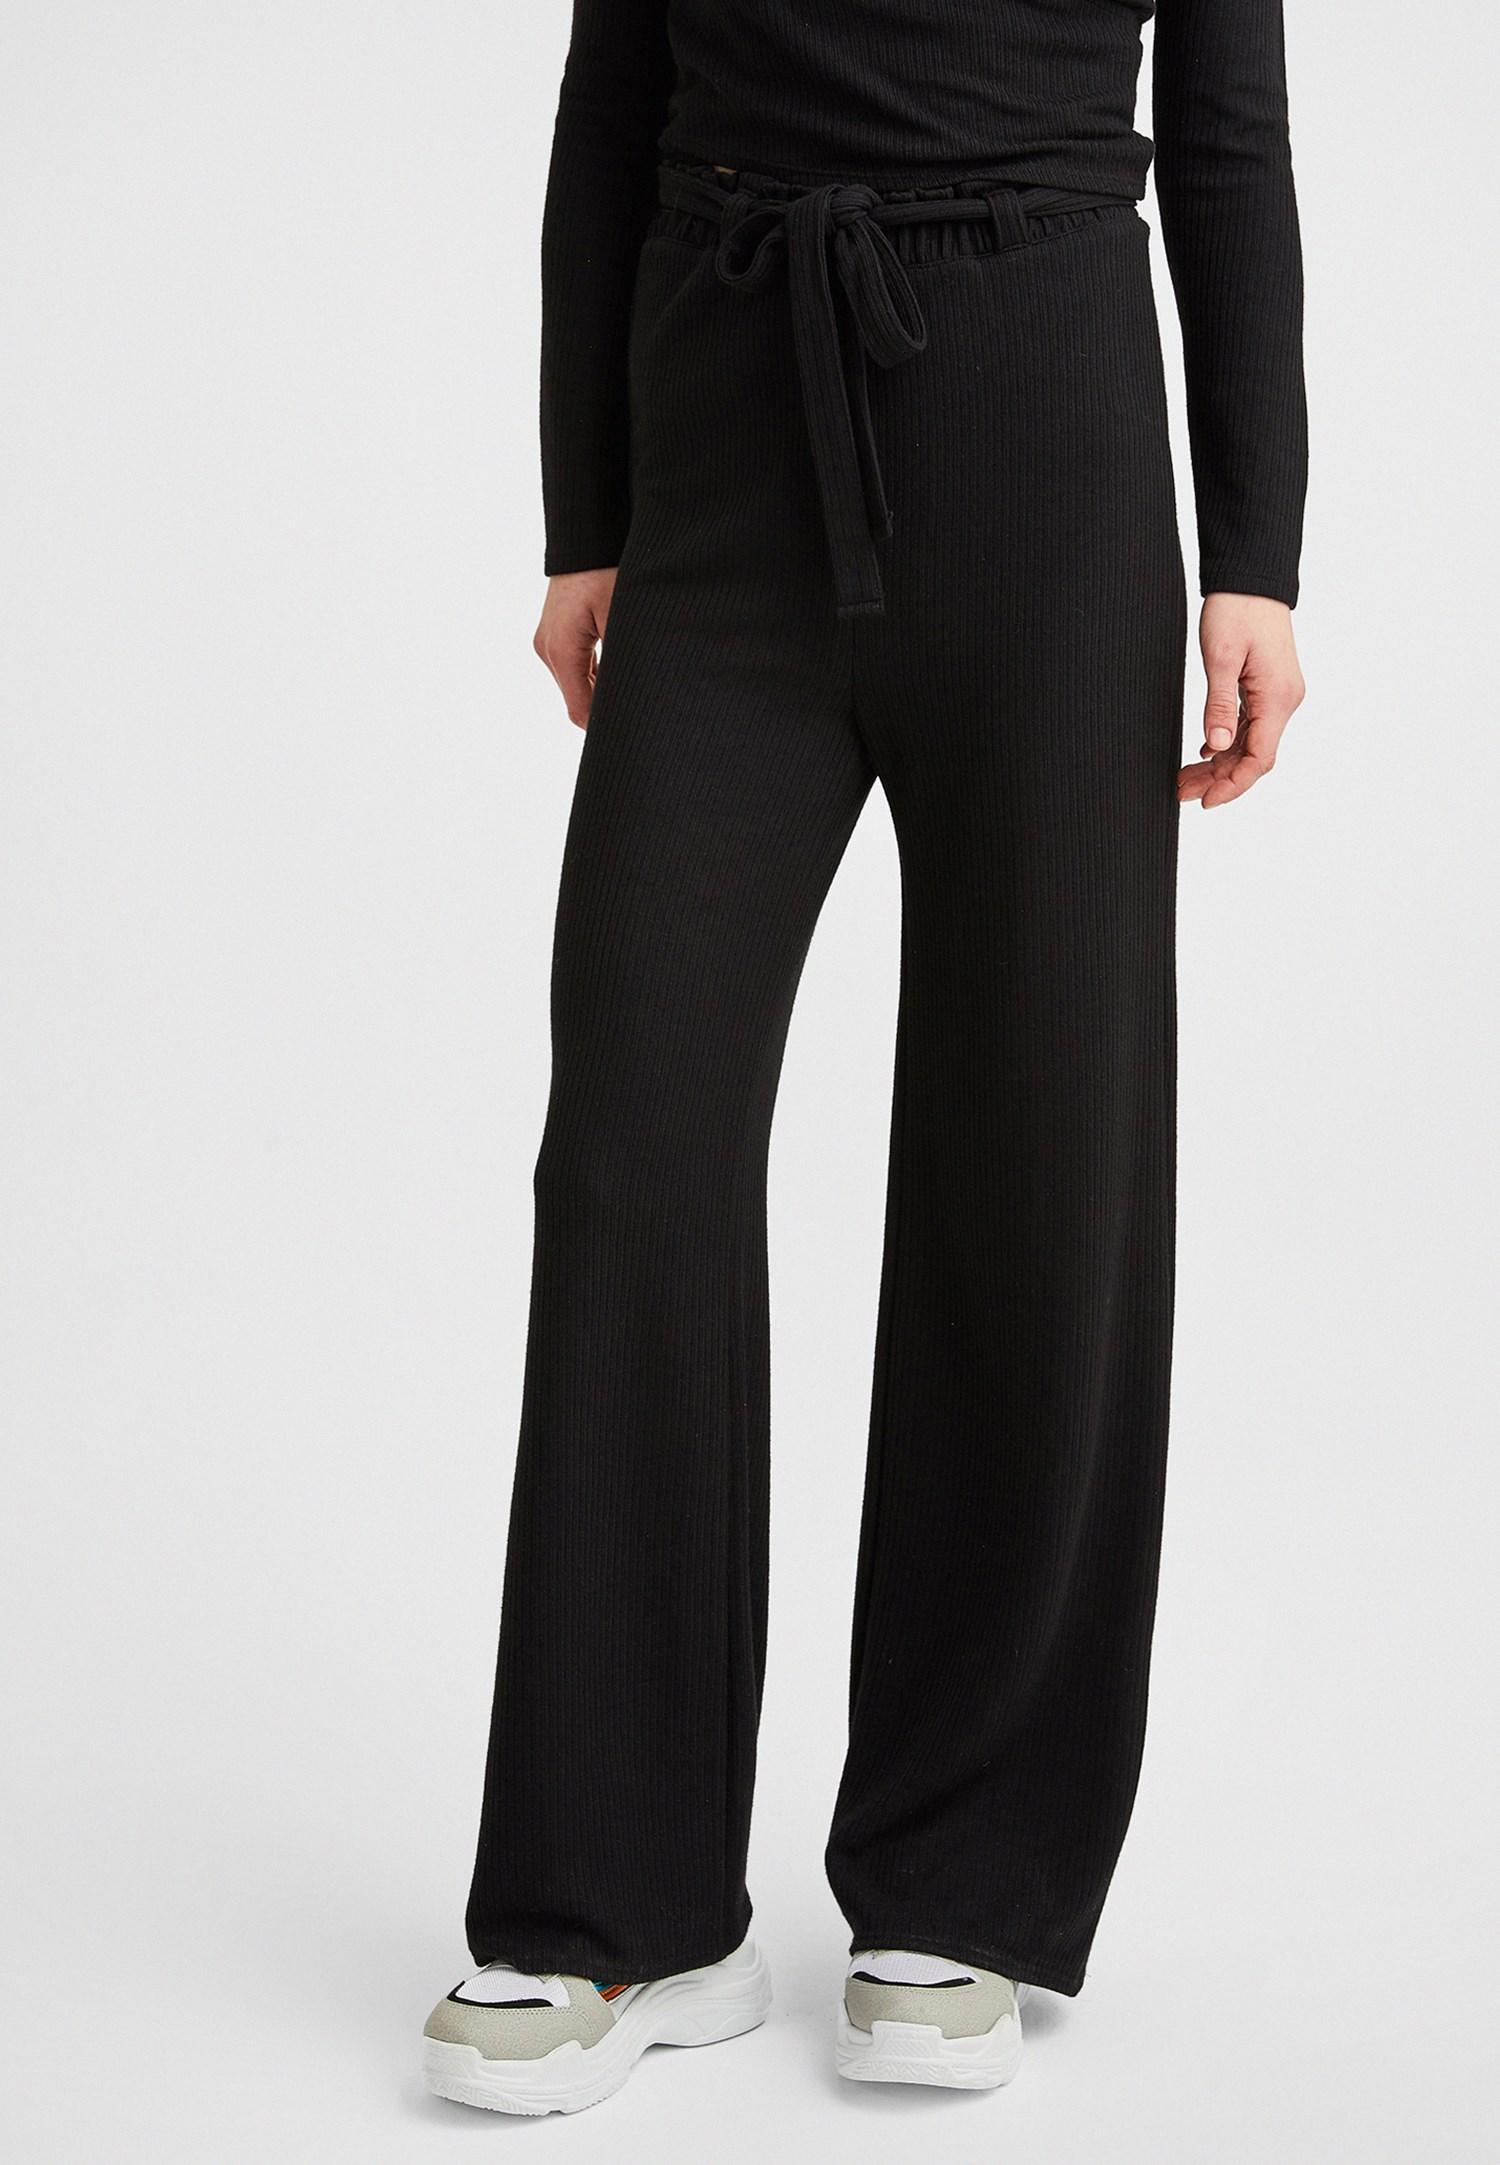 Bayan Siyah Beli Bağlama Detaylı Bol Pantolon